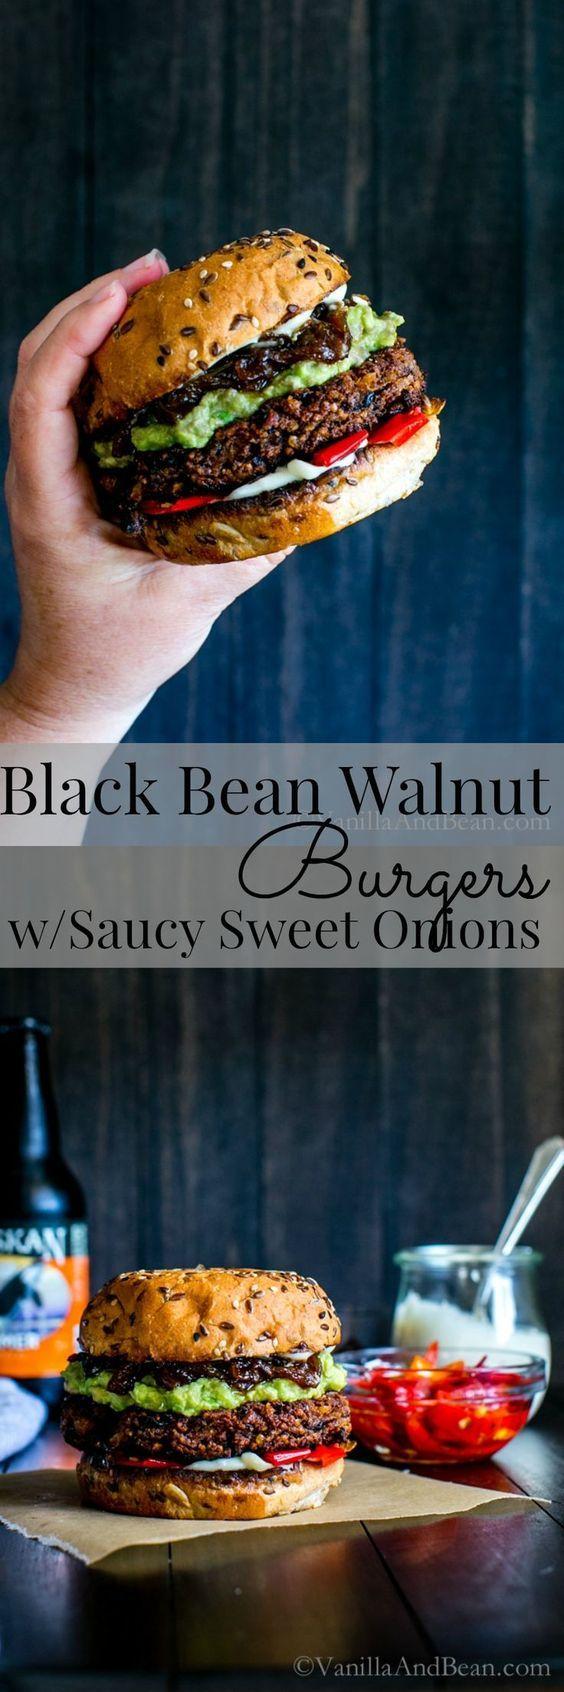 awesome Black Bean Walnut Burgers